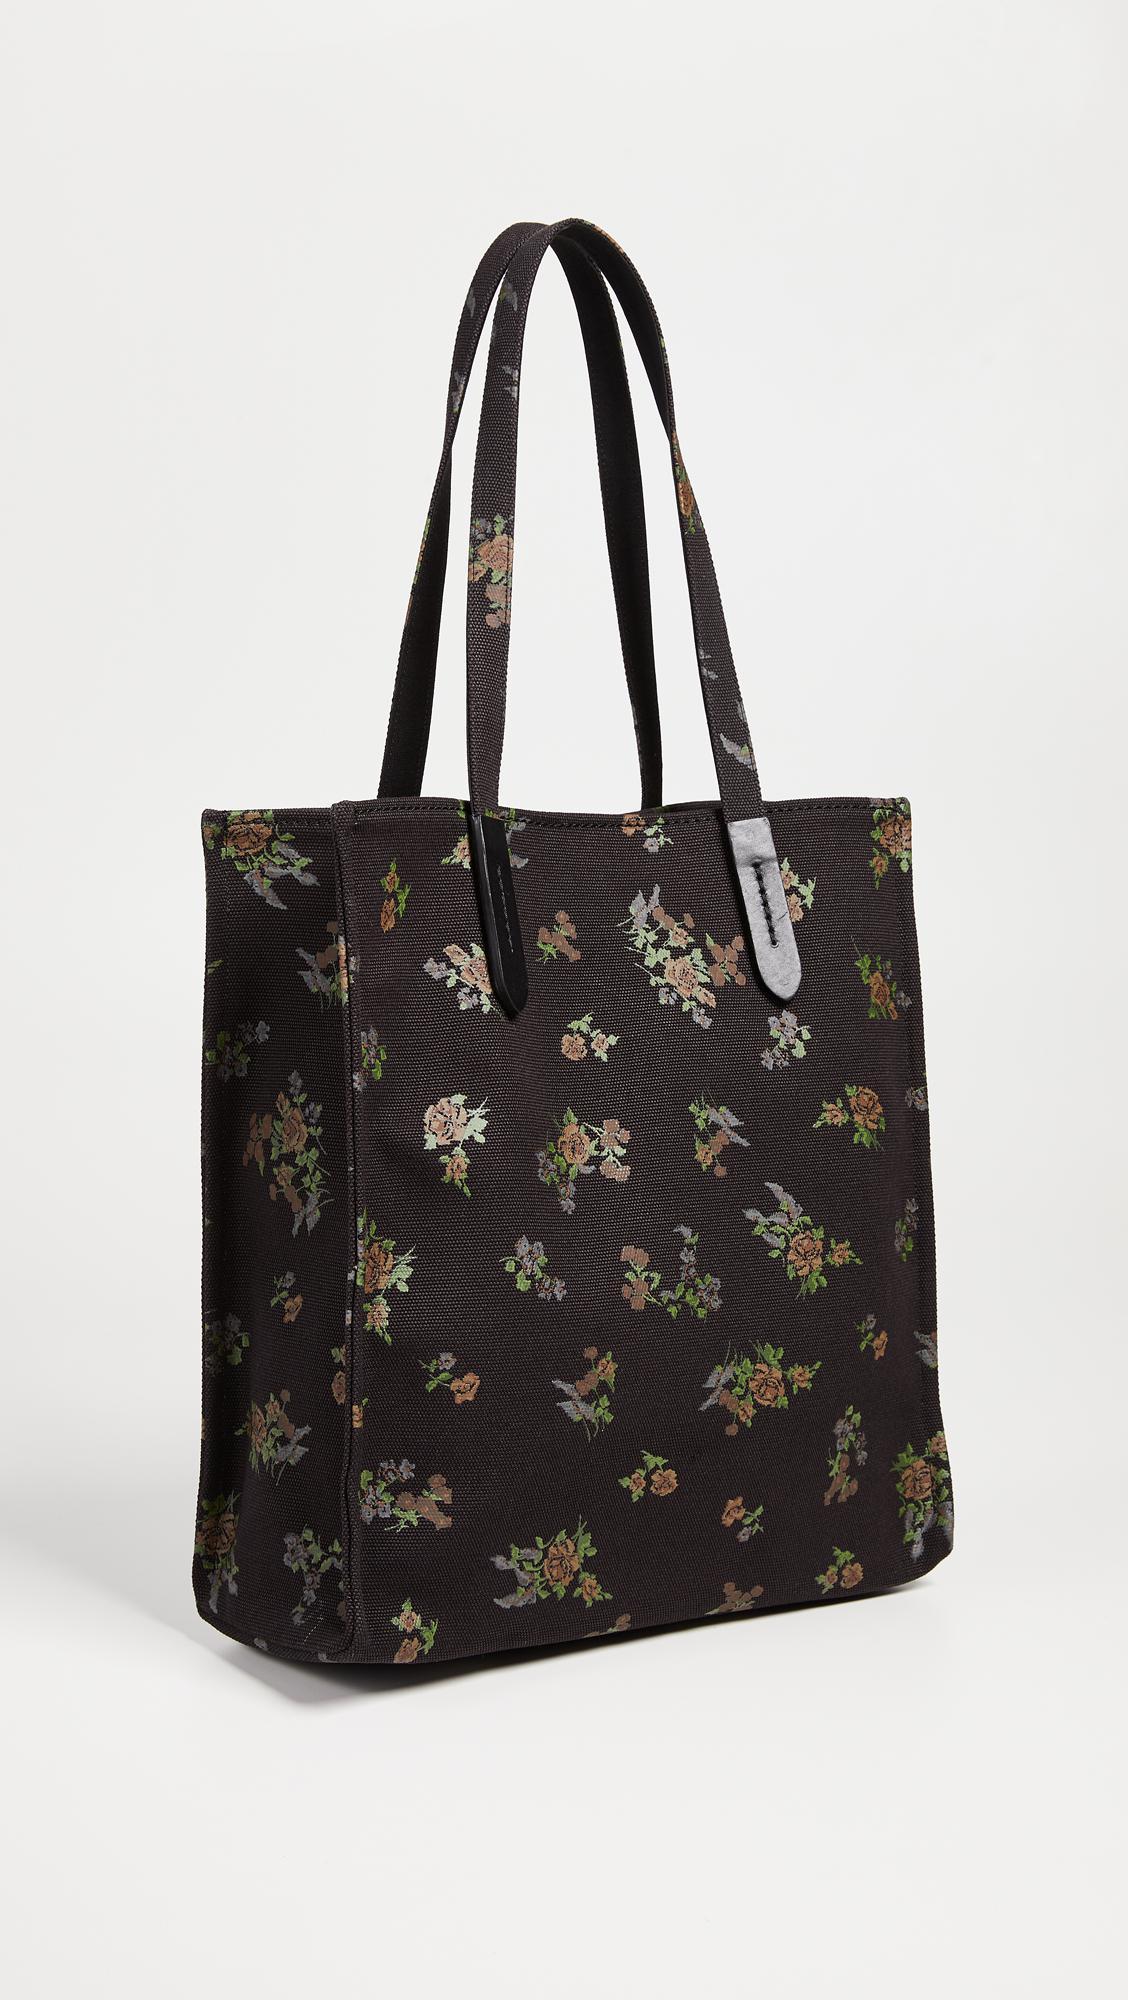 COACH Canvas Signature Love Tote Bag in Black